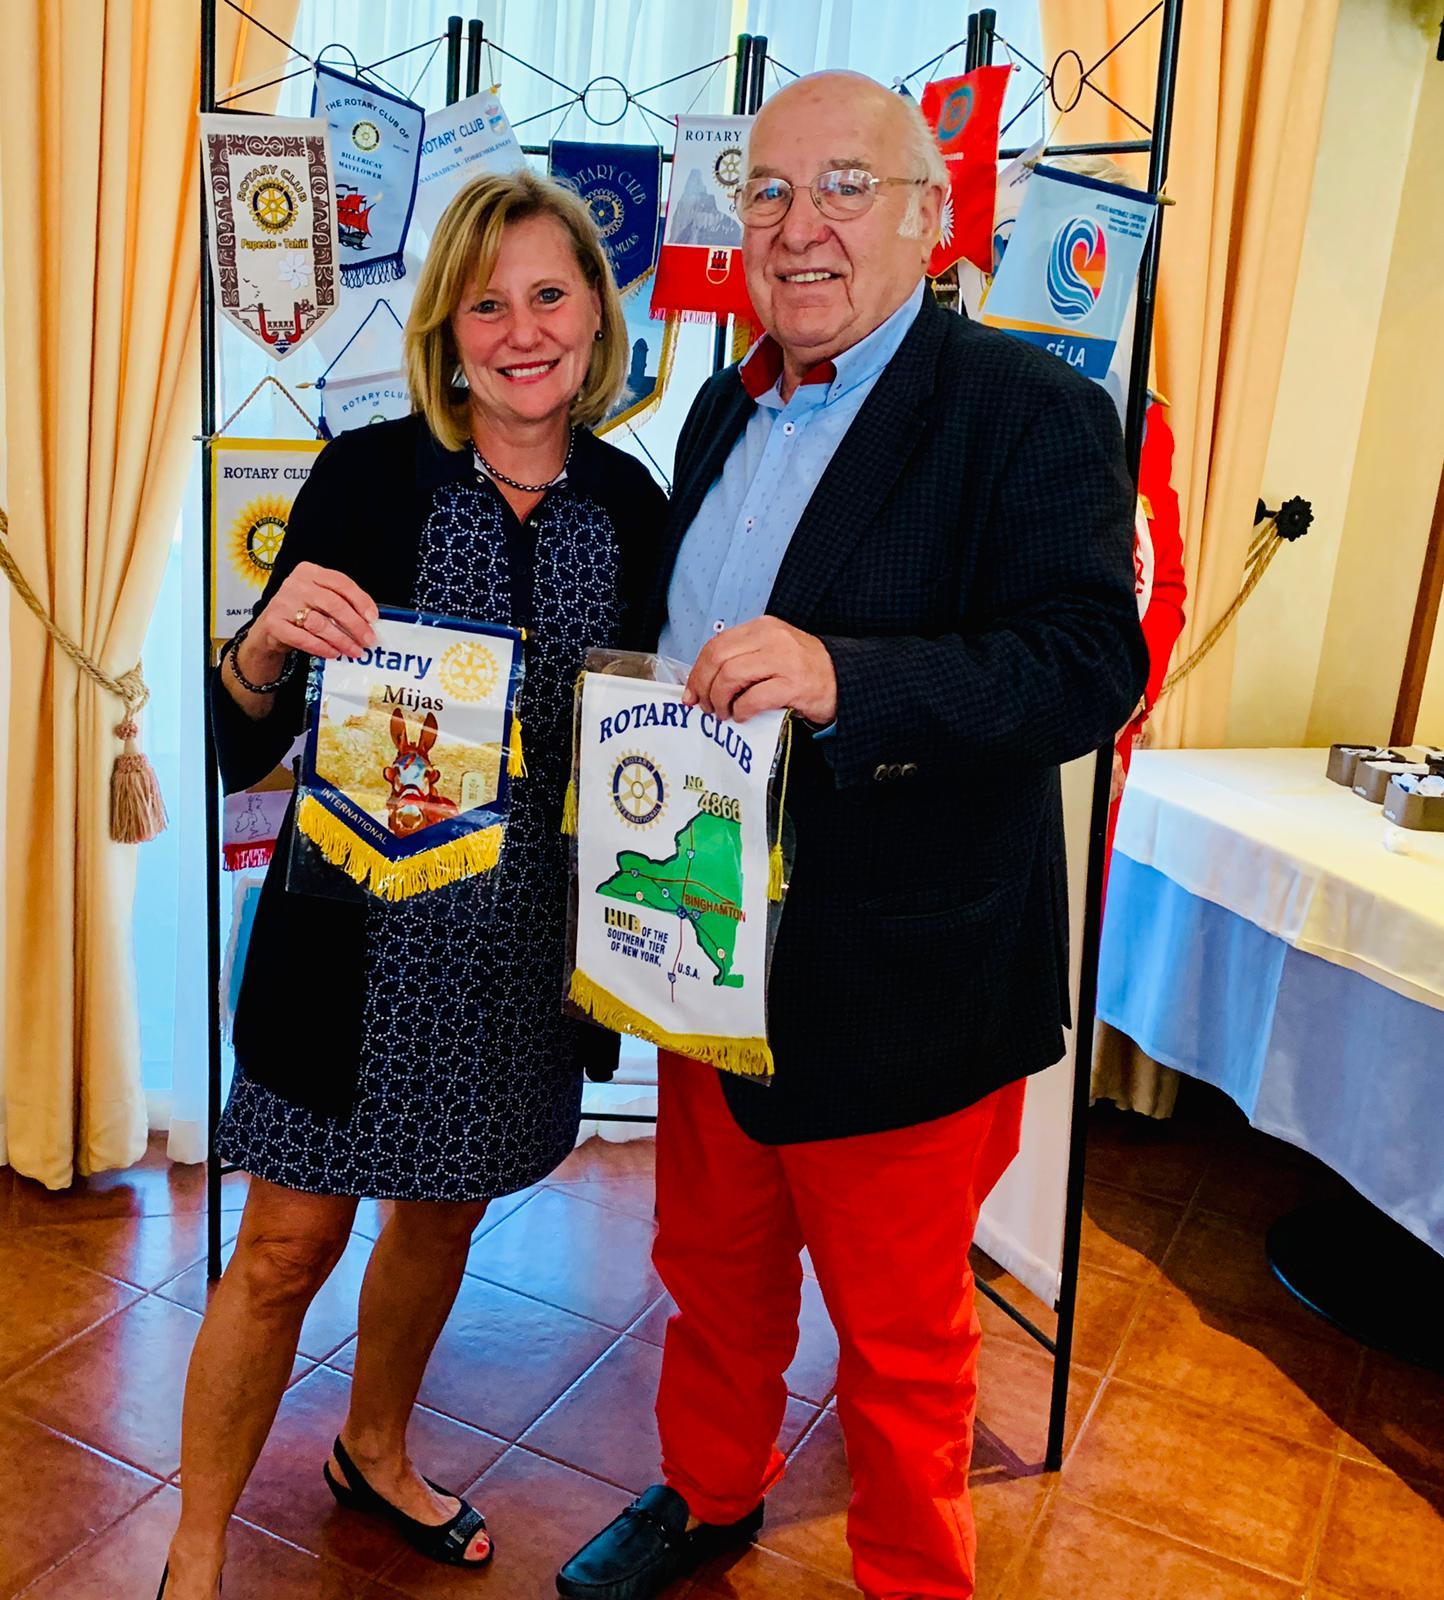 Member-Mary-Surdey-visits-Spain-Rotary-Meeting-(1)